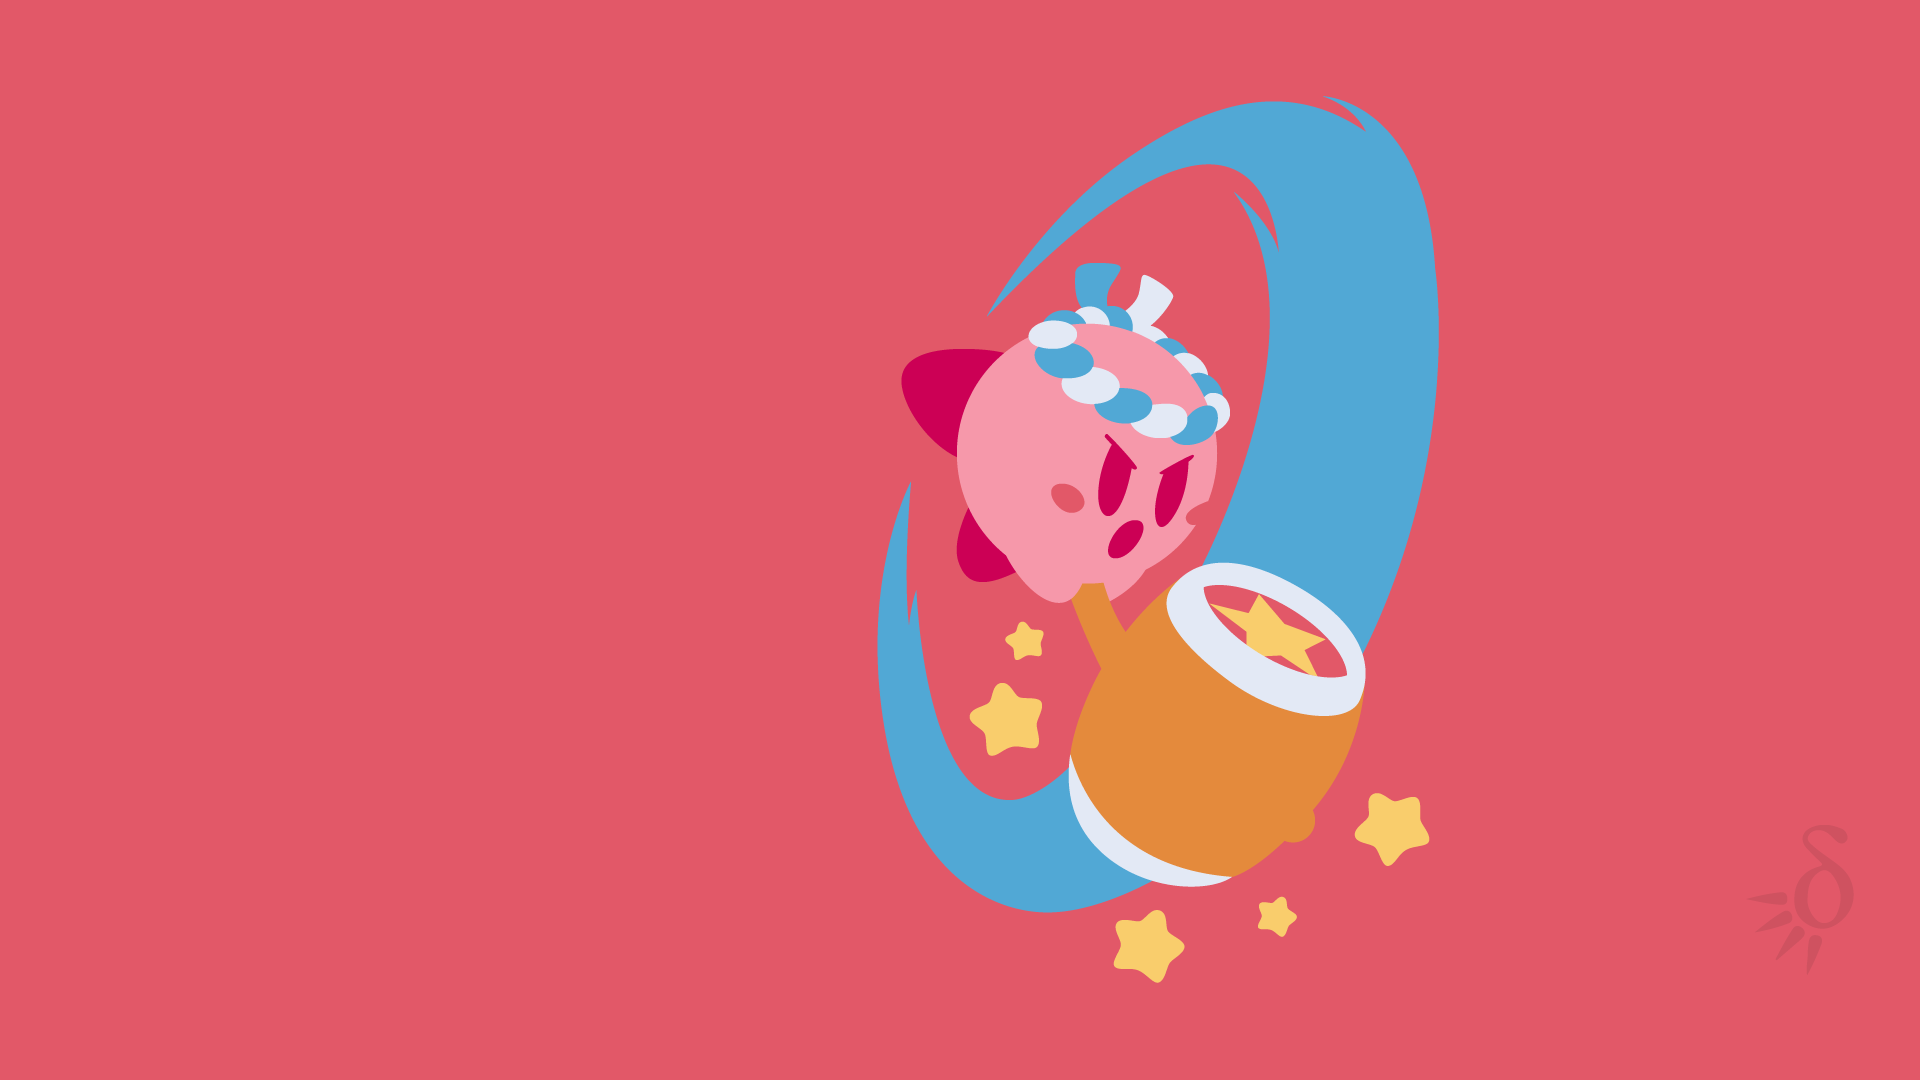 Hammer Kirby by Krukmeister